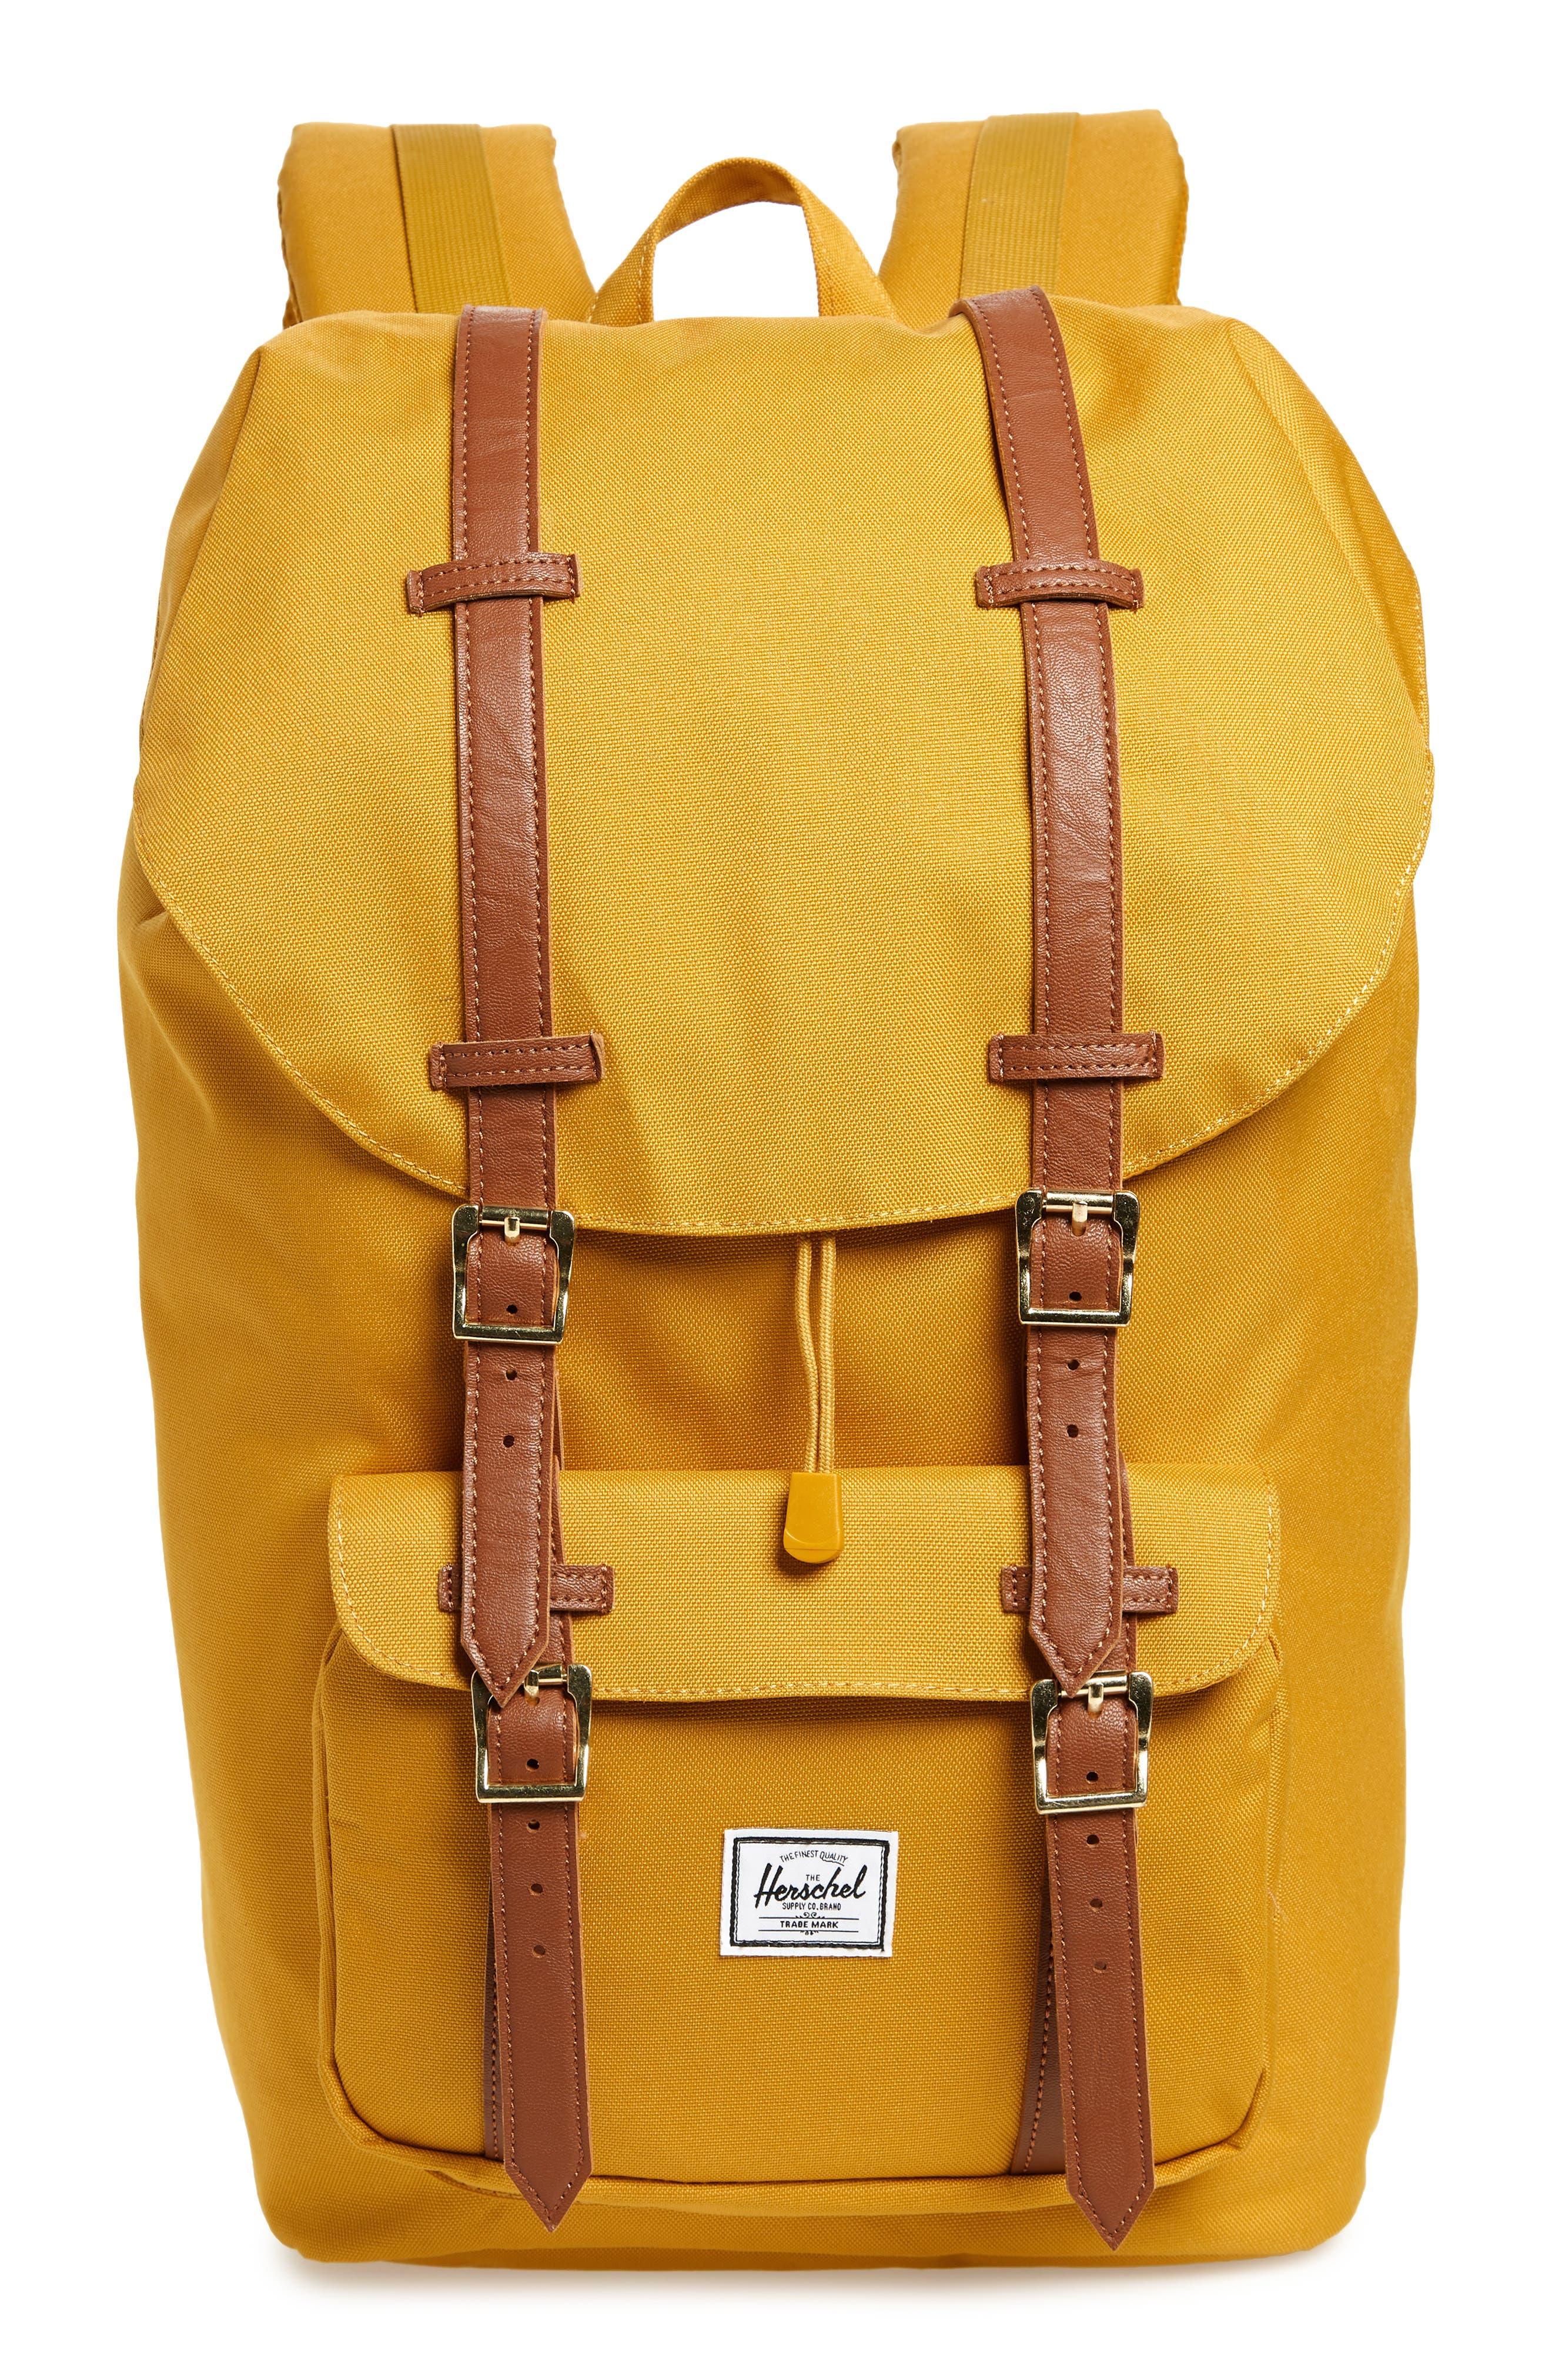 HERSCHEL SUPPLY CO. Little America Backpack - Yellow in Arrow Wood/ Tan Leather